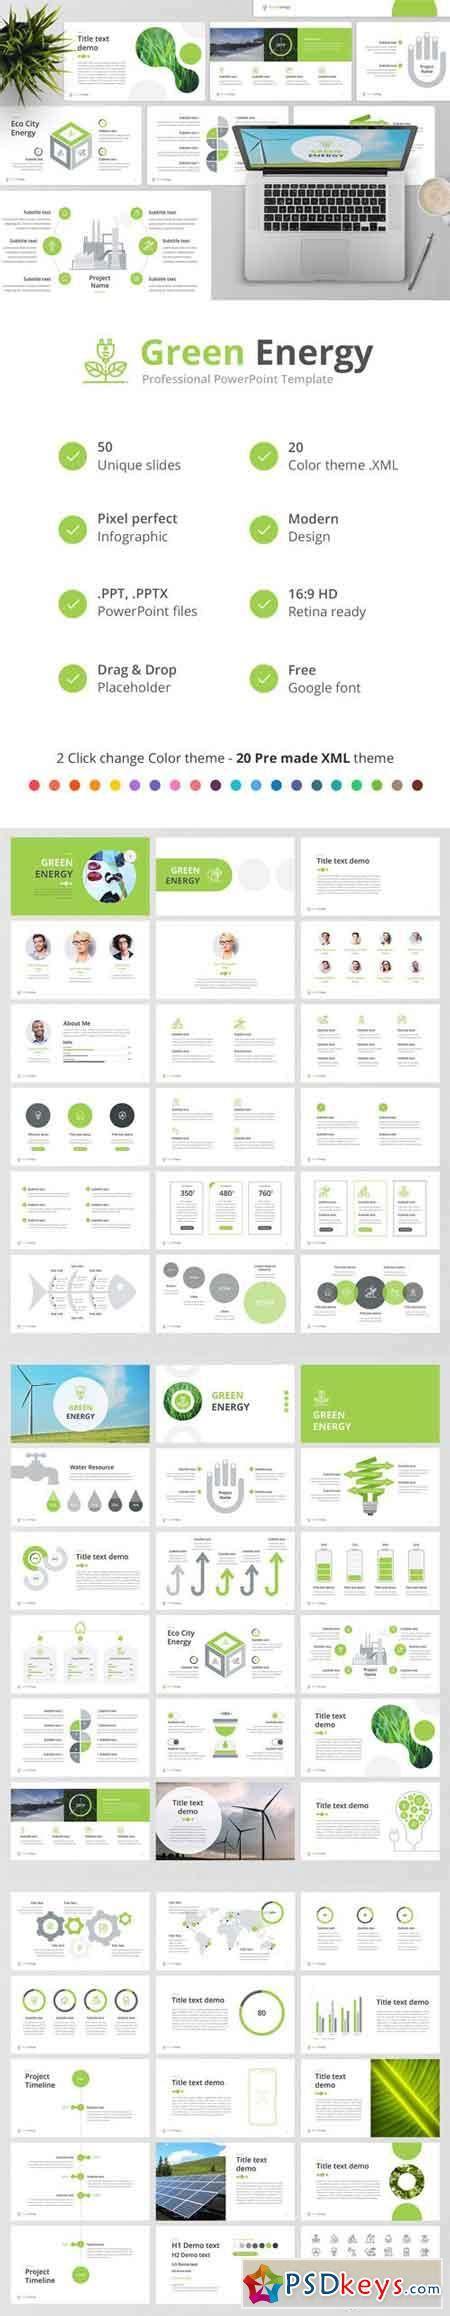 xml tutorial ebook free download powerpoint template xml gallery powerpoint template and